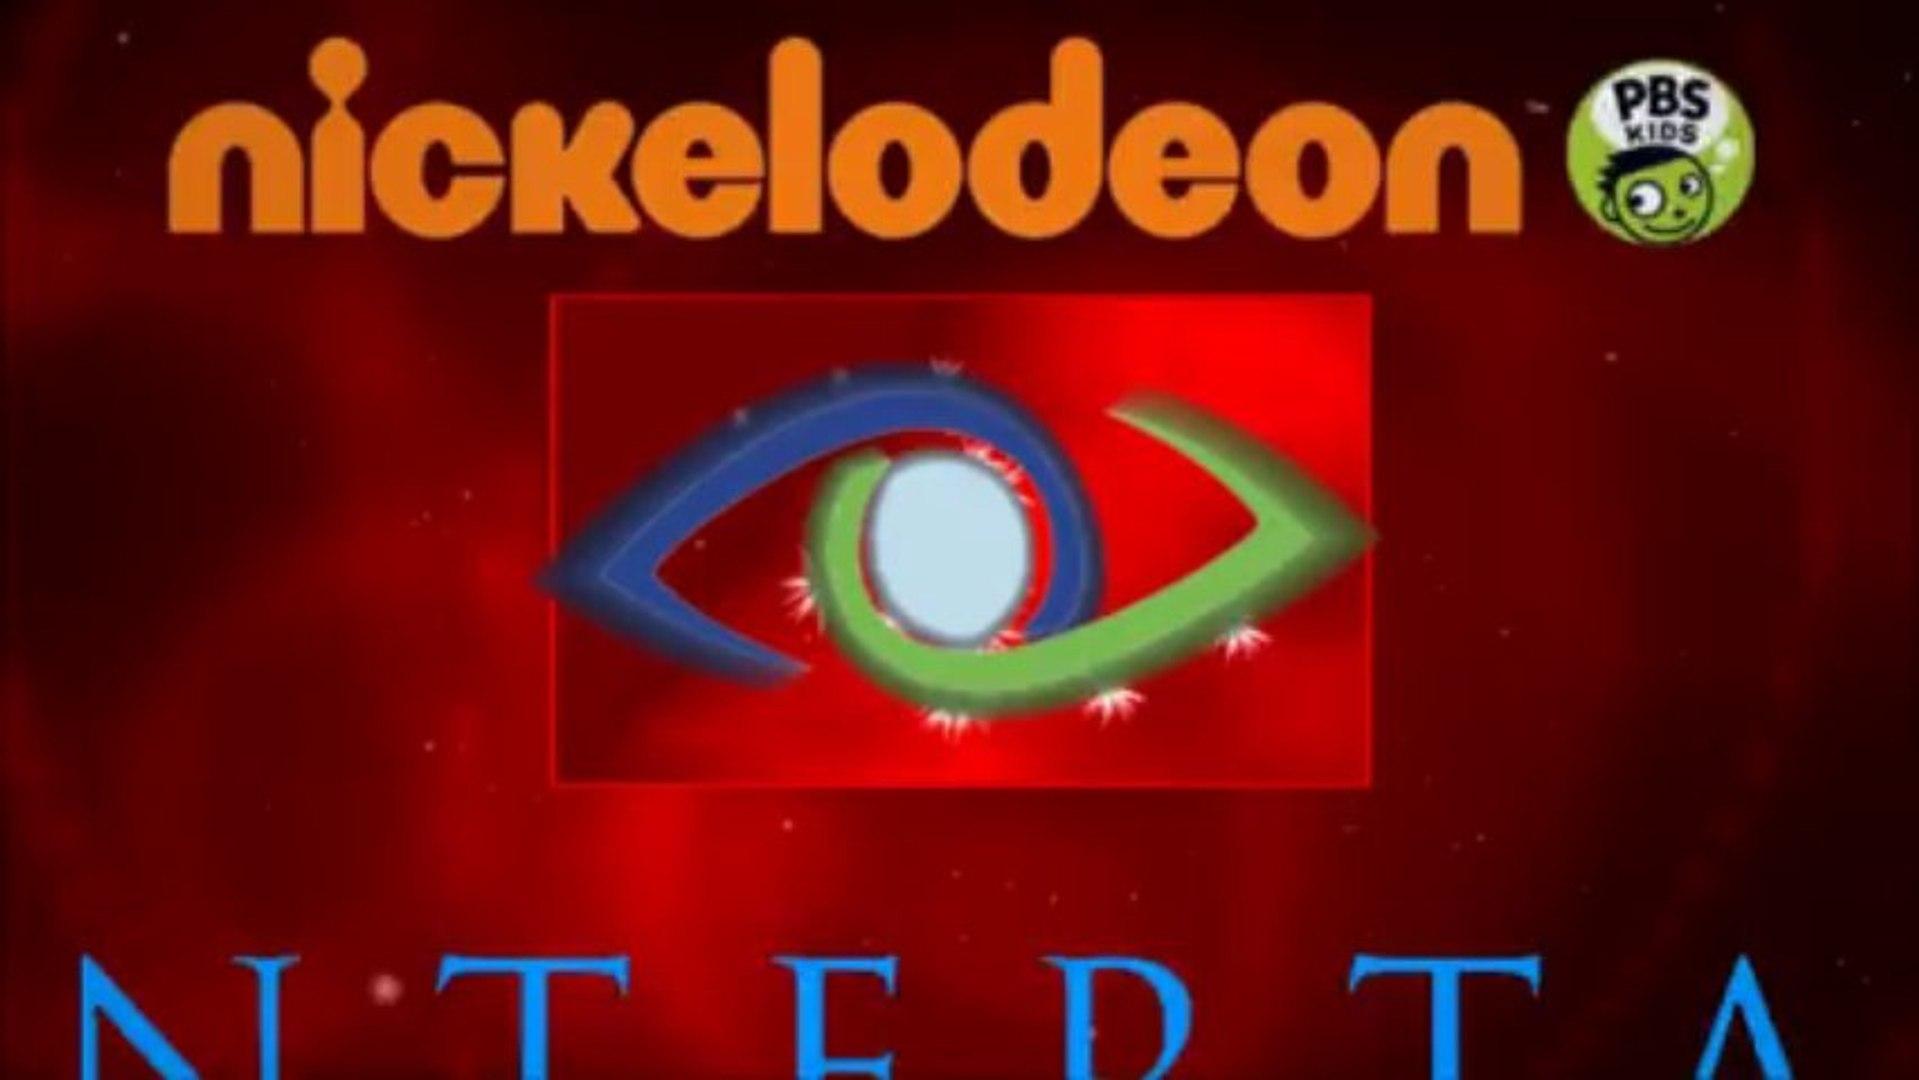 Nickelodeon PBS Kids Music Entertainment (2015) (2nd logo)